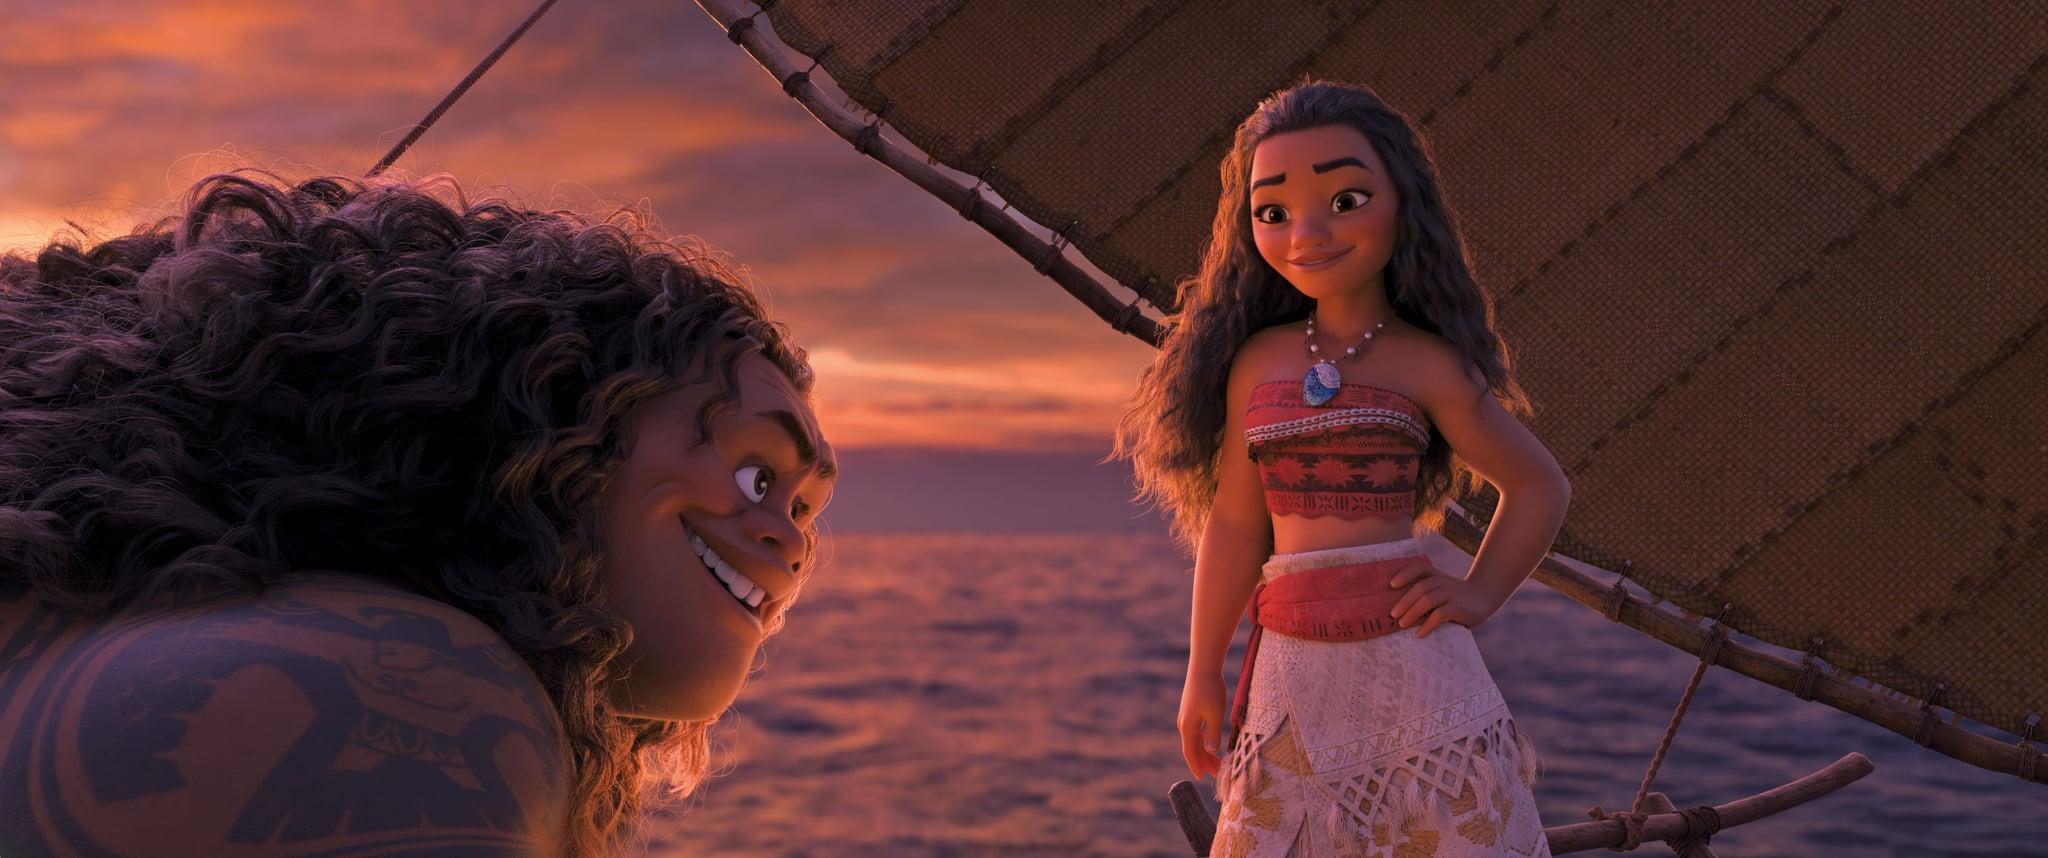 MOANA, from left, Maui (voice: Dwayne Johnson), Moana (voice: Auli'i Cravalho), 2016.  Walt Disney Studios Motion Pictures / courtesy Everett Collection